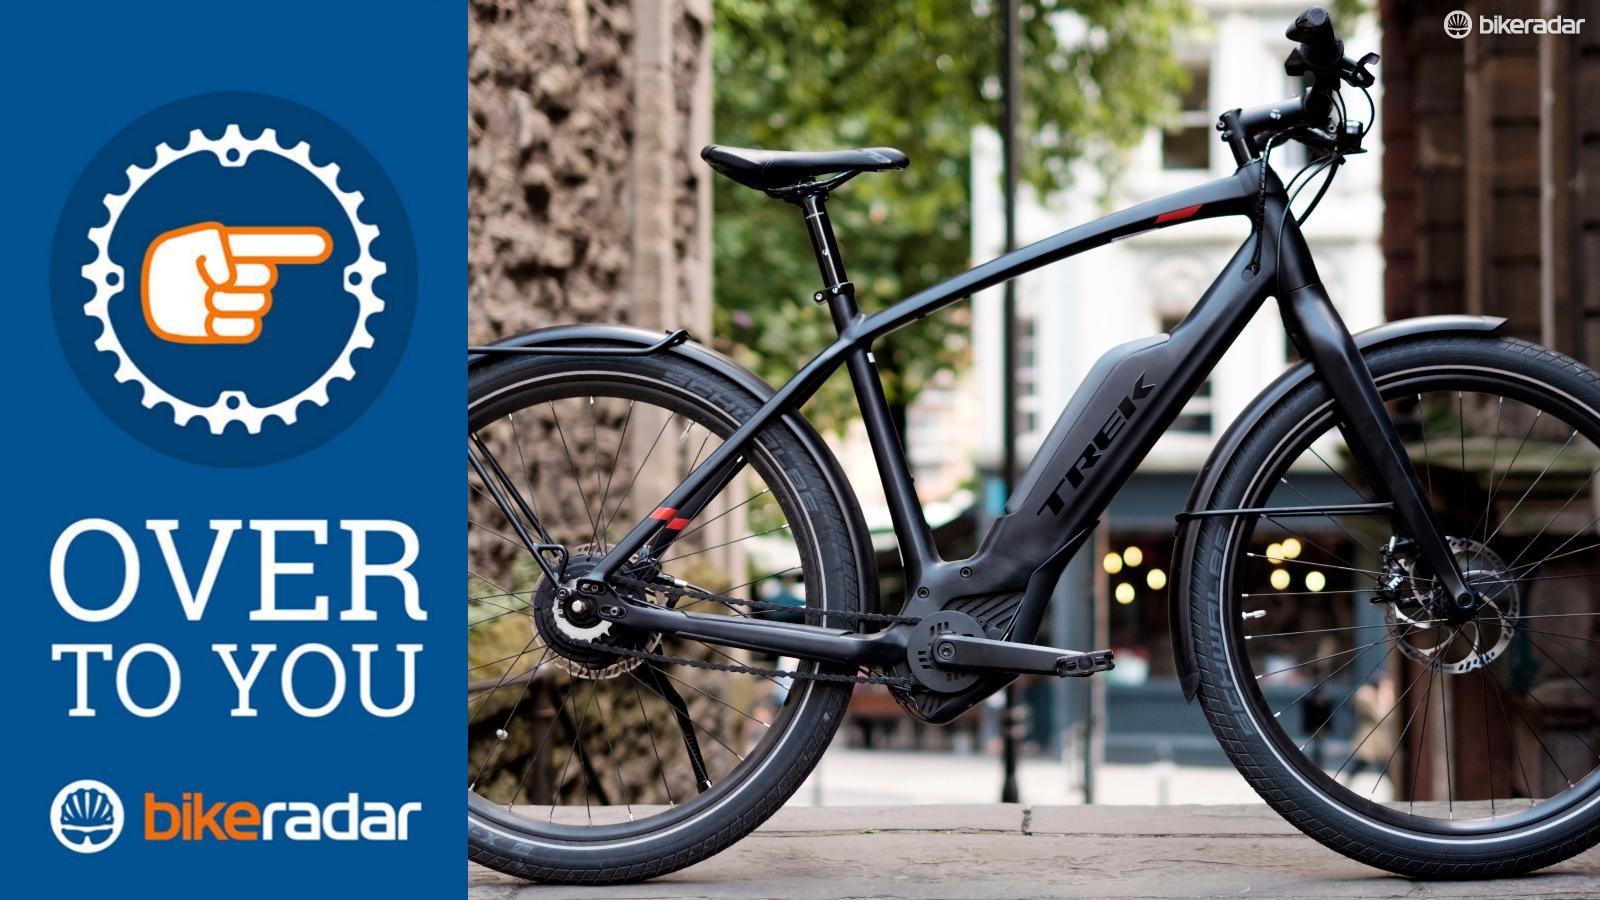 Do you care about e-bikes?